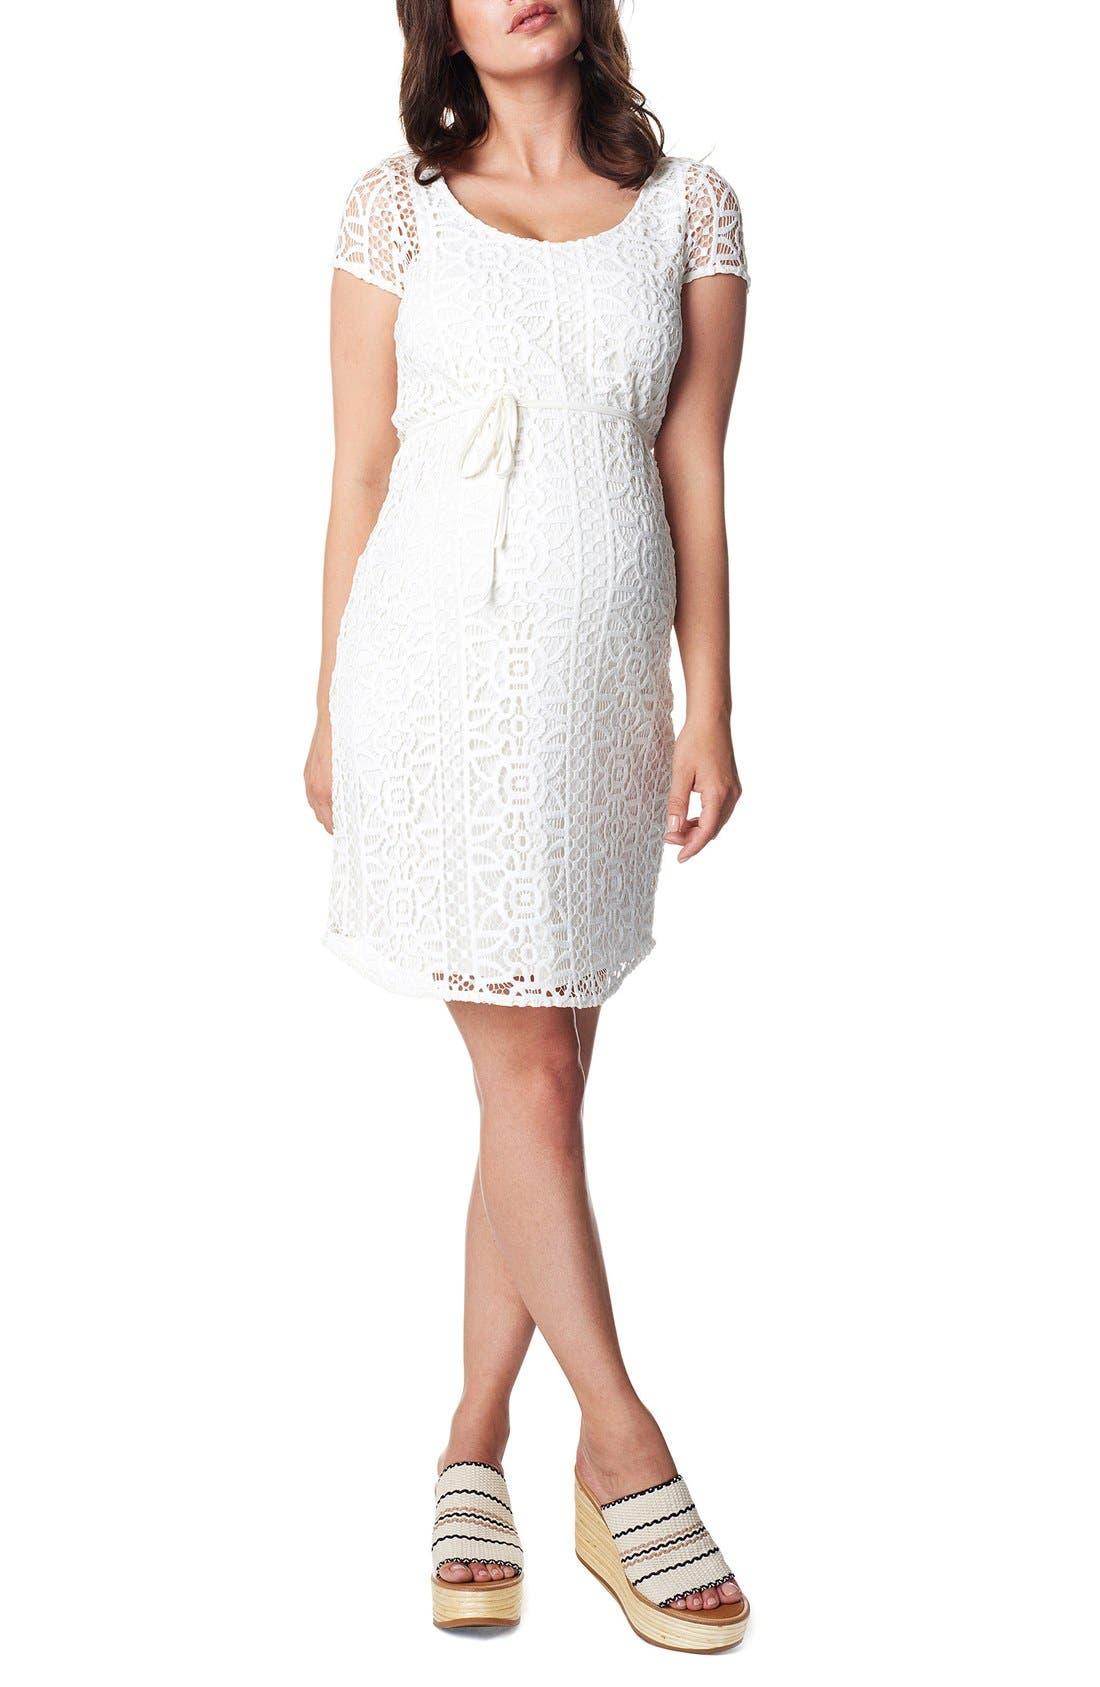 Elise Woven Lace Maternity Dress,                             Main thumbnail 1, color,                             OFF WHITE